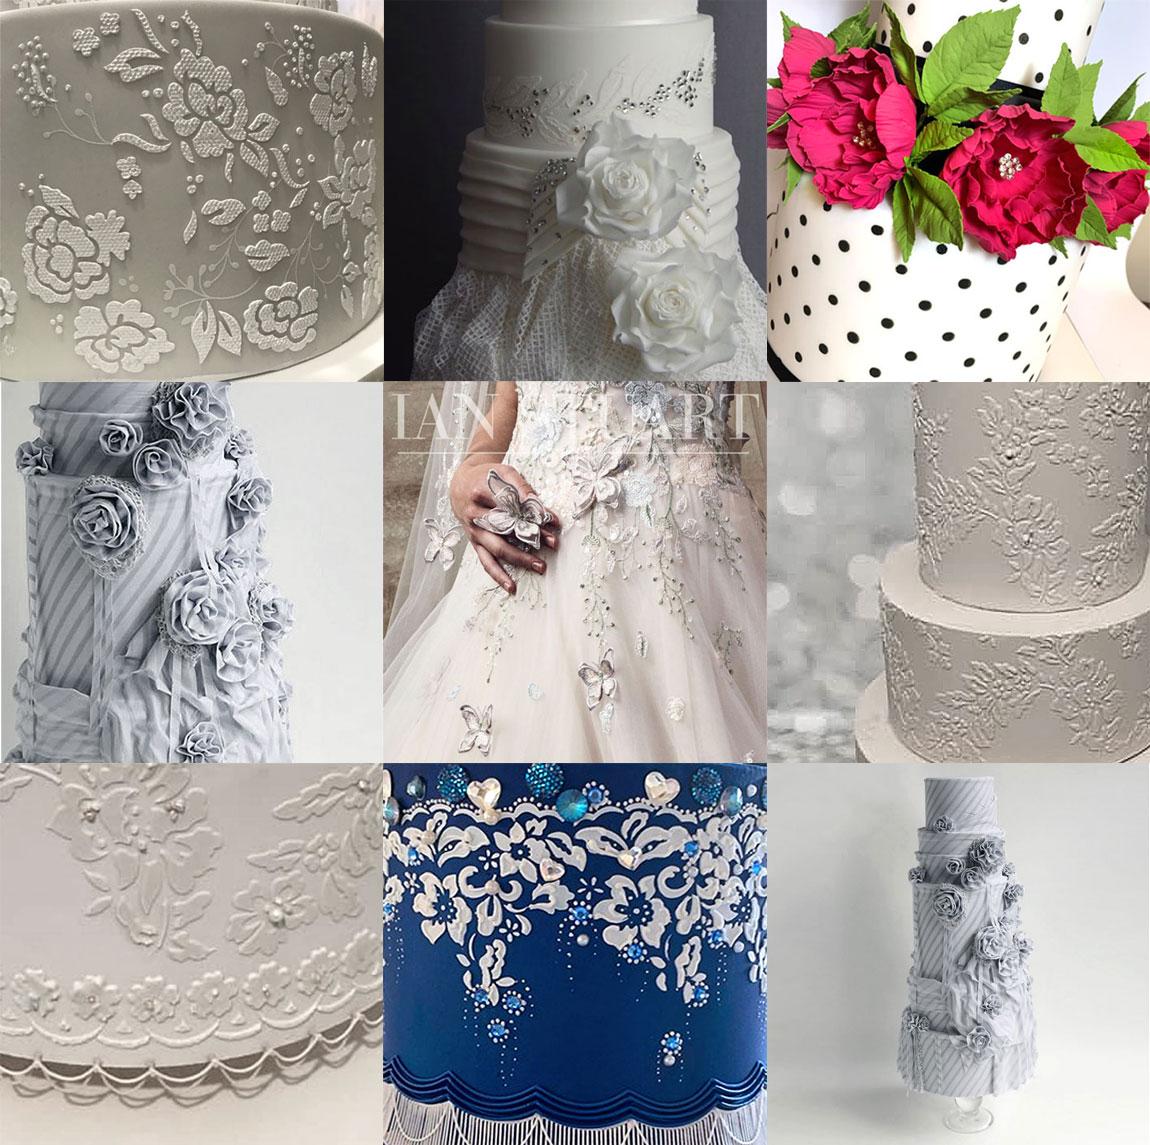 Ian Stuart Wedding Collection